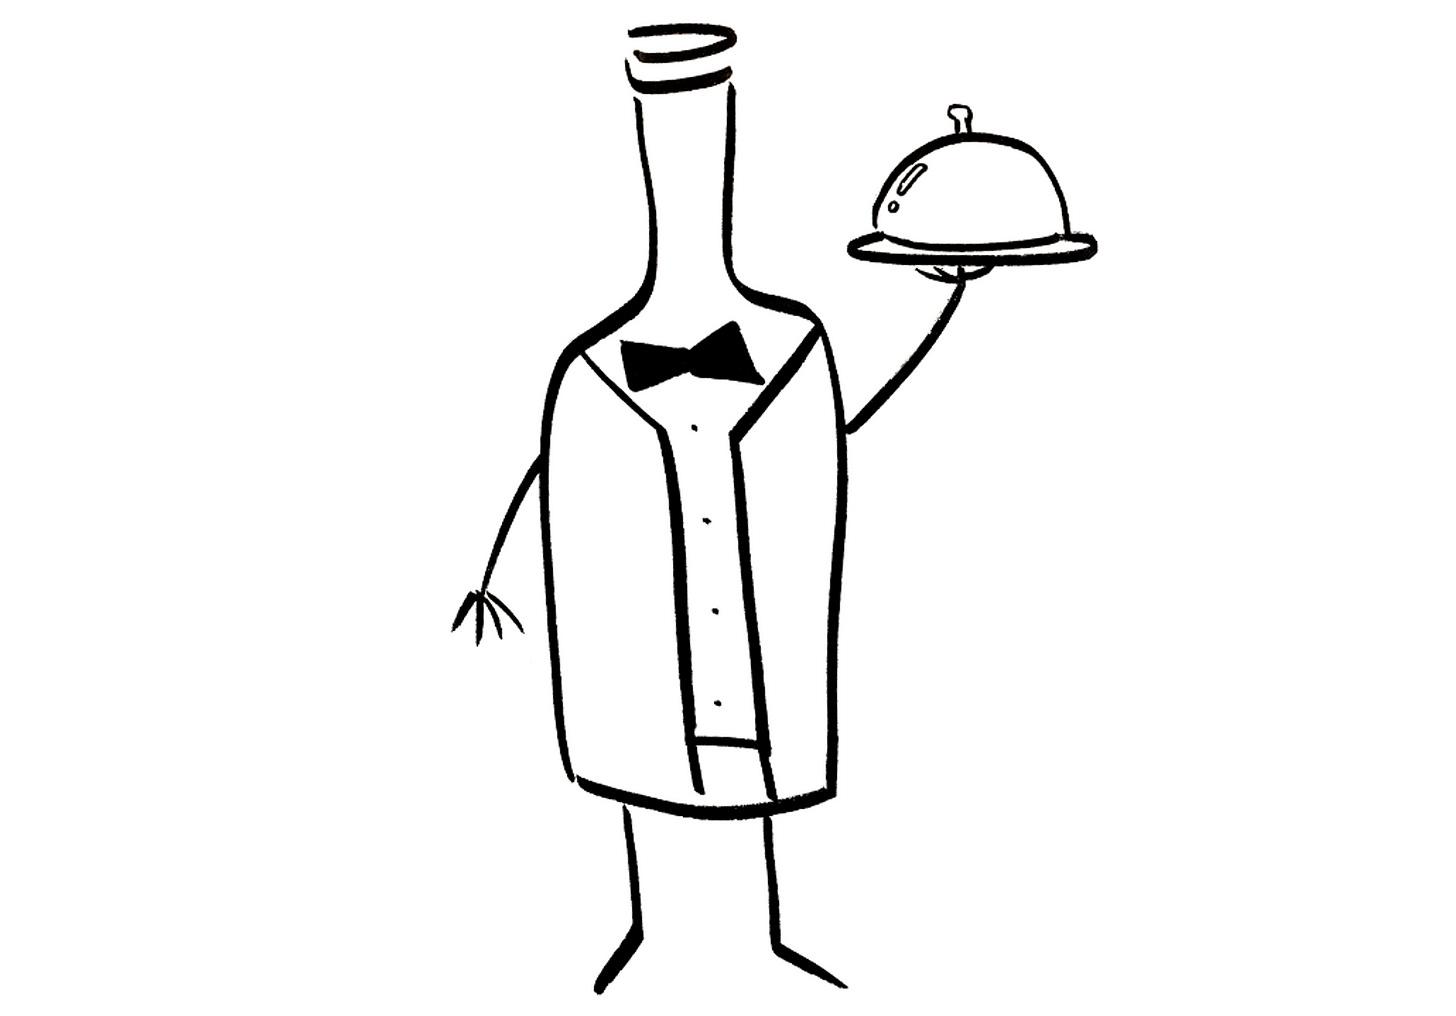 An anthropomorphic wine bottle dressed as a restaurant server